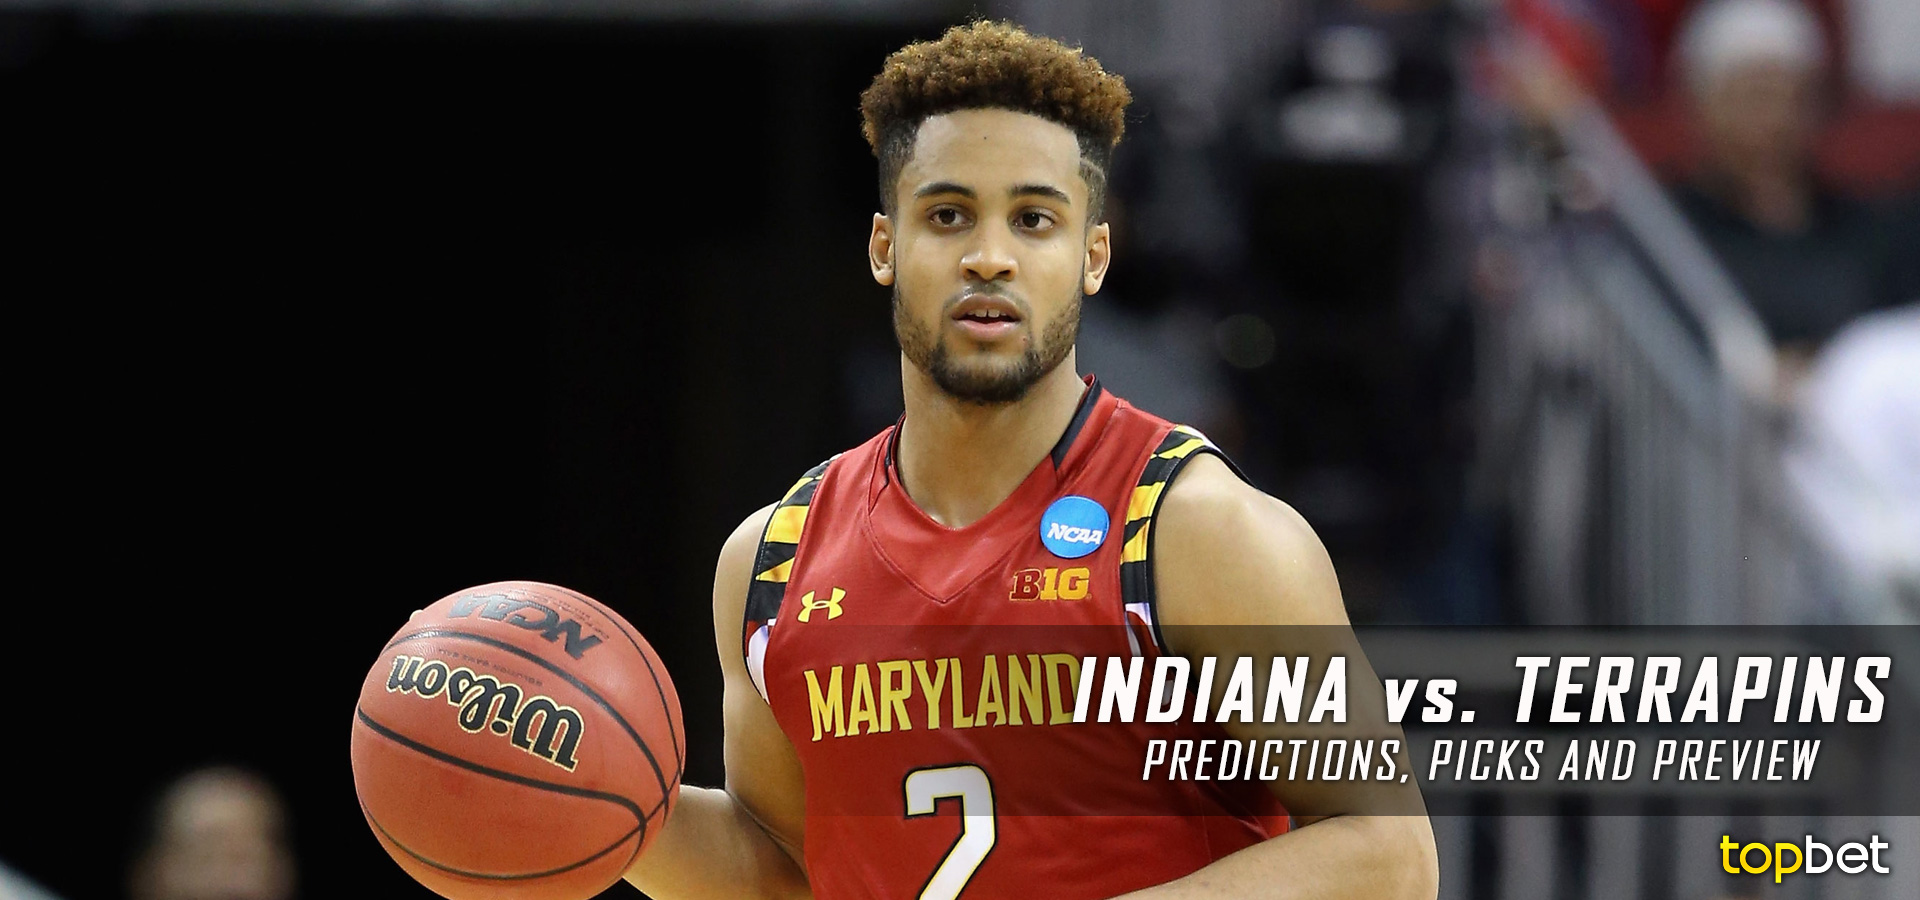 Indiana vs Maryland Basketball Predictions, Picks & Preview